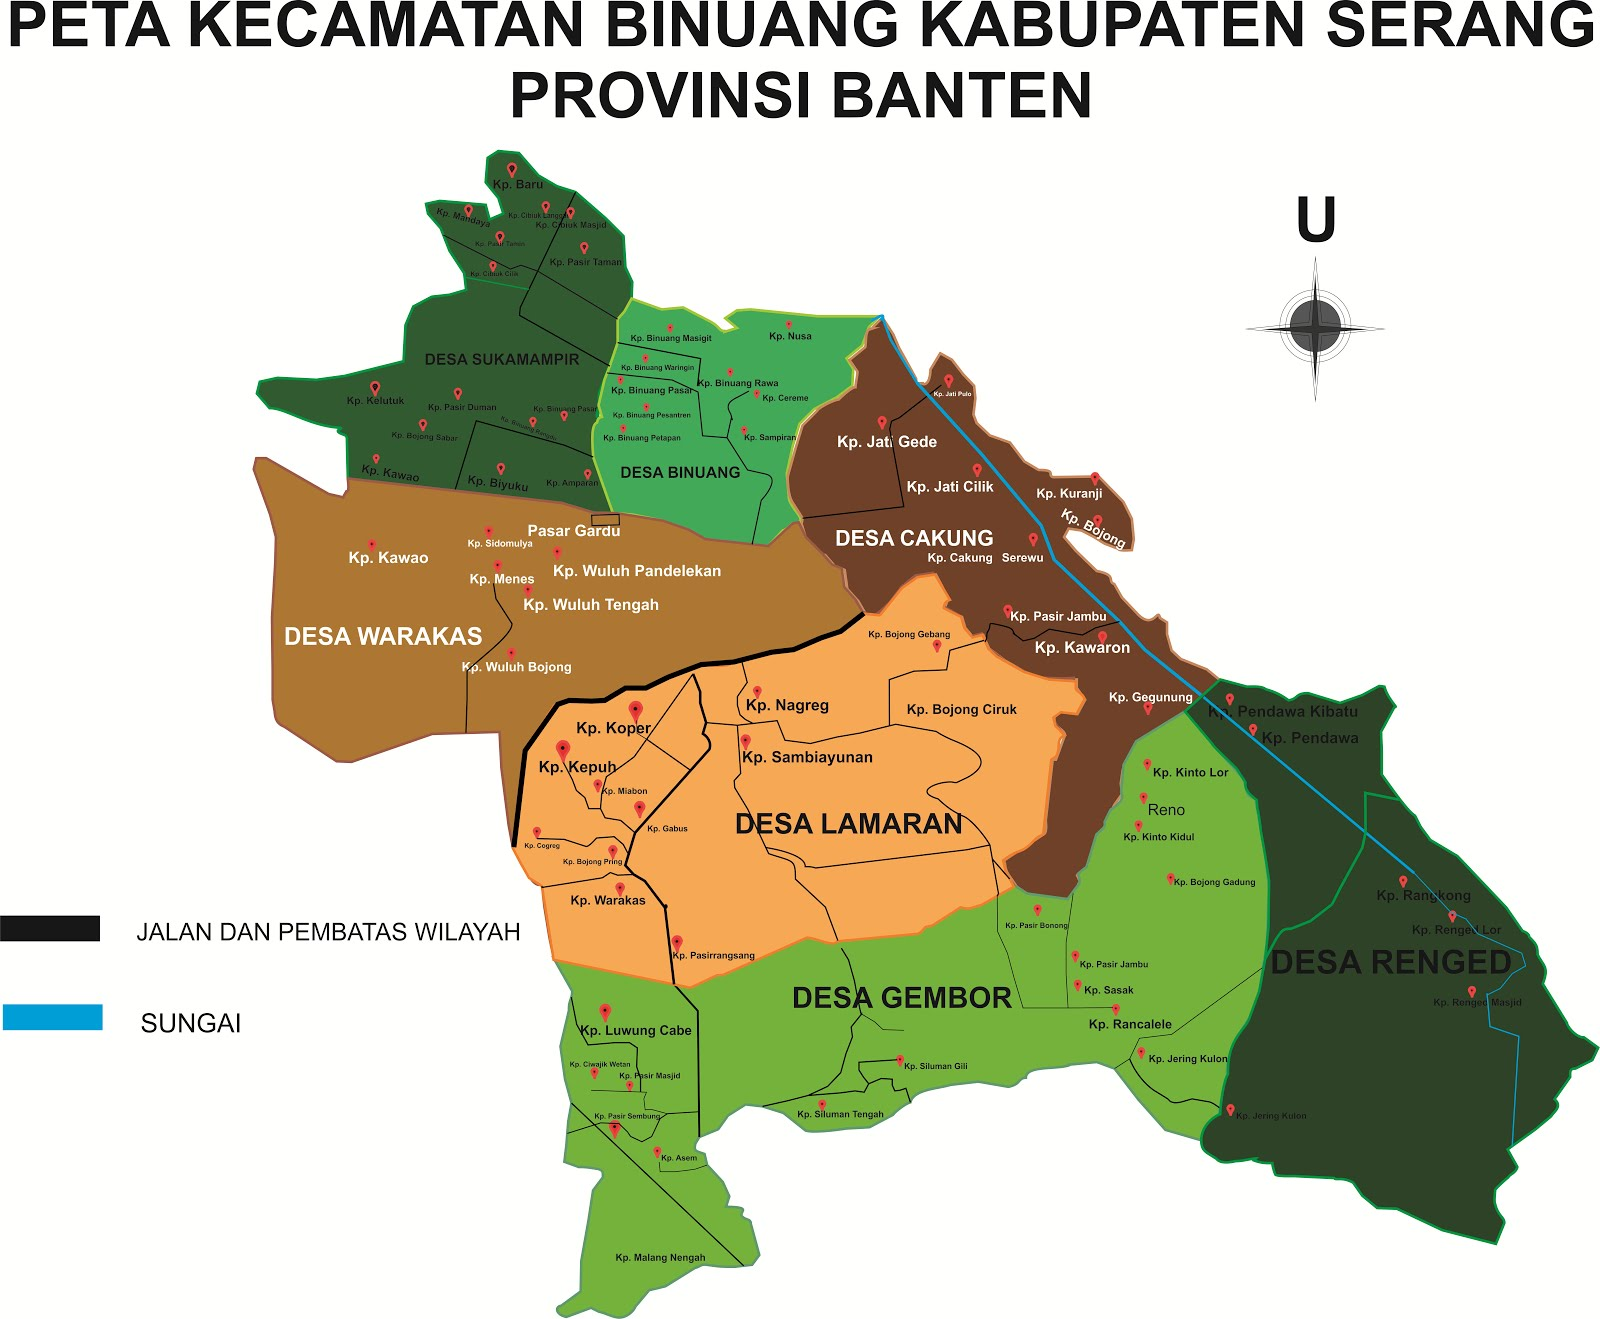 Nama Kampung Kecamatan Binuang Kabupaten Serang Provinsi Berbagi Informasi Seputar